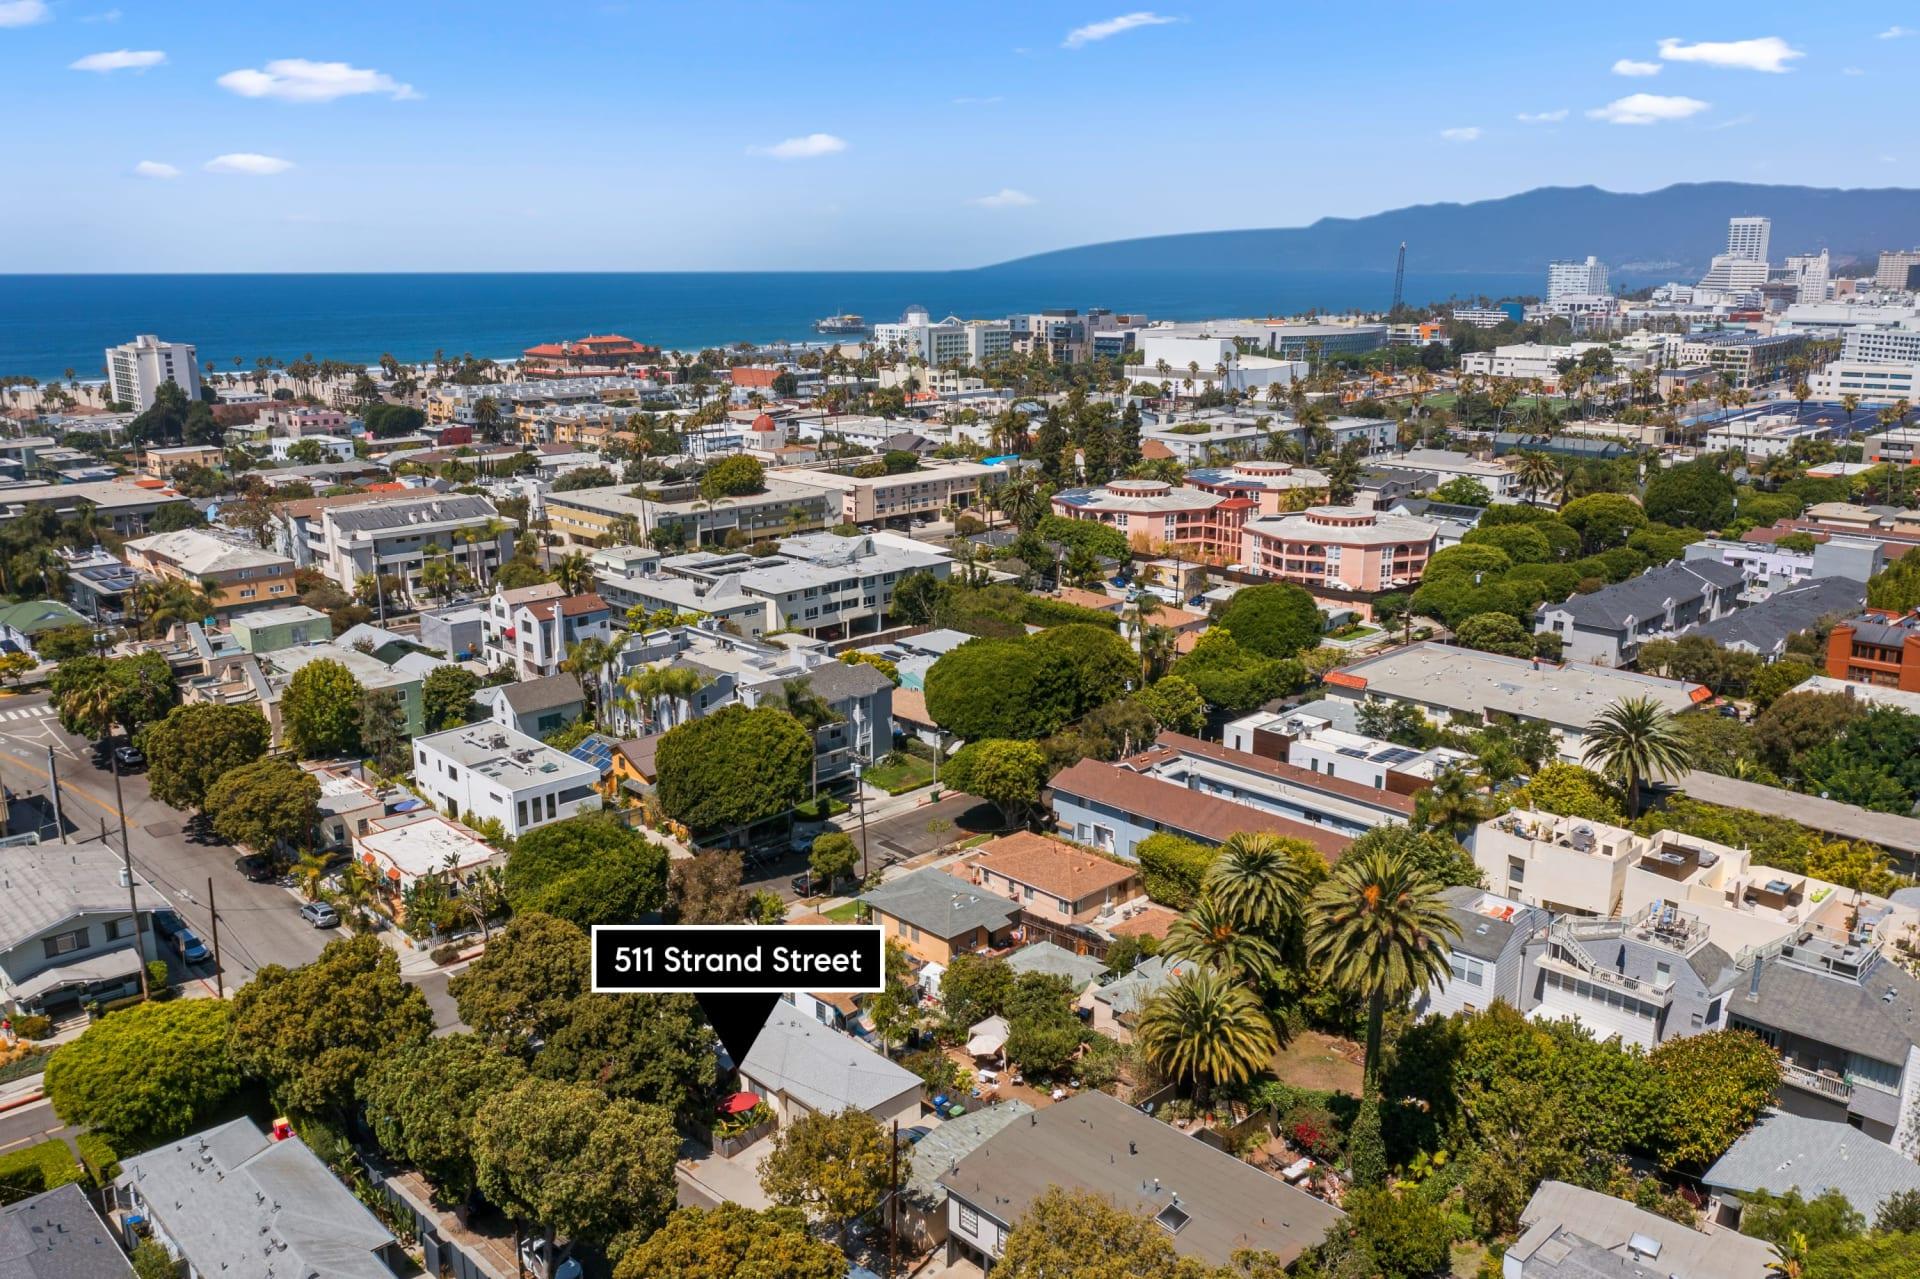 Investment Opportunity in Santa Monica | 511 Strand Street, Santa Monica, CA 90405